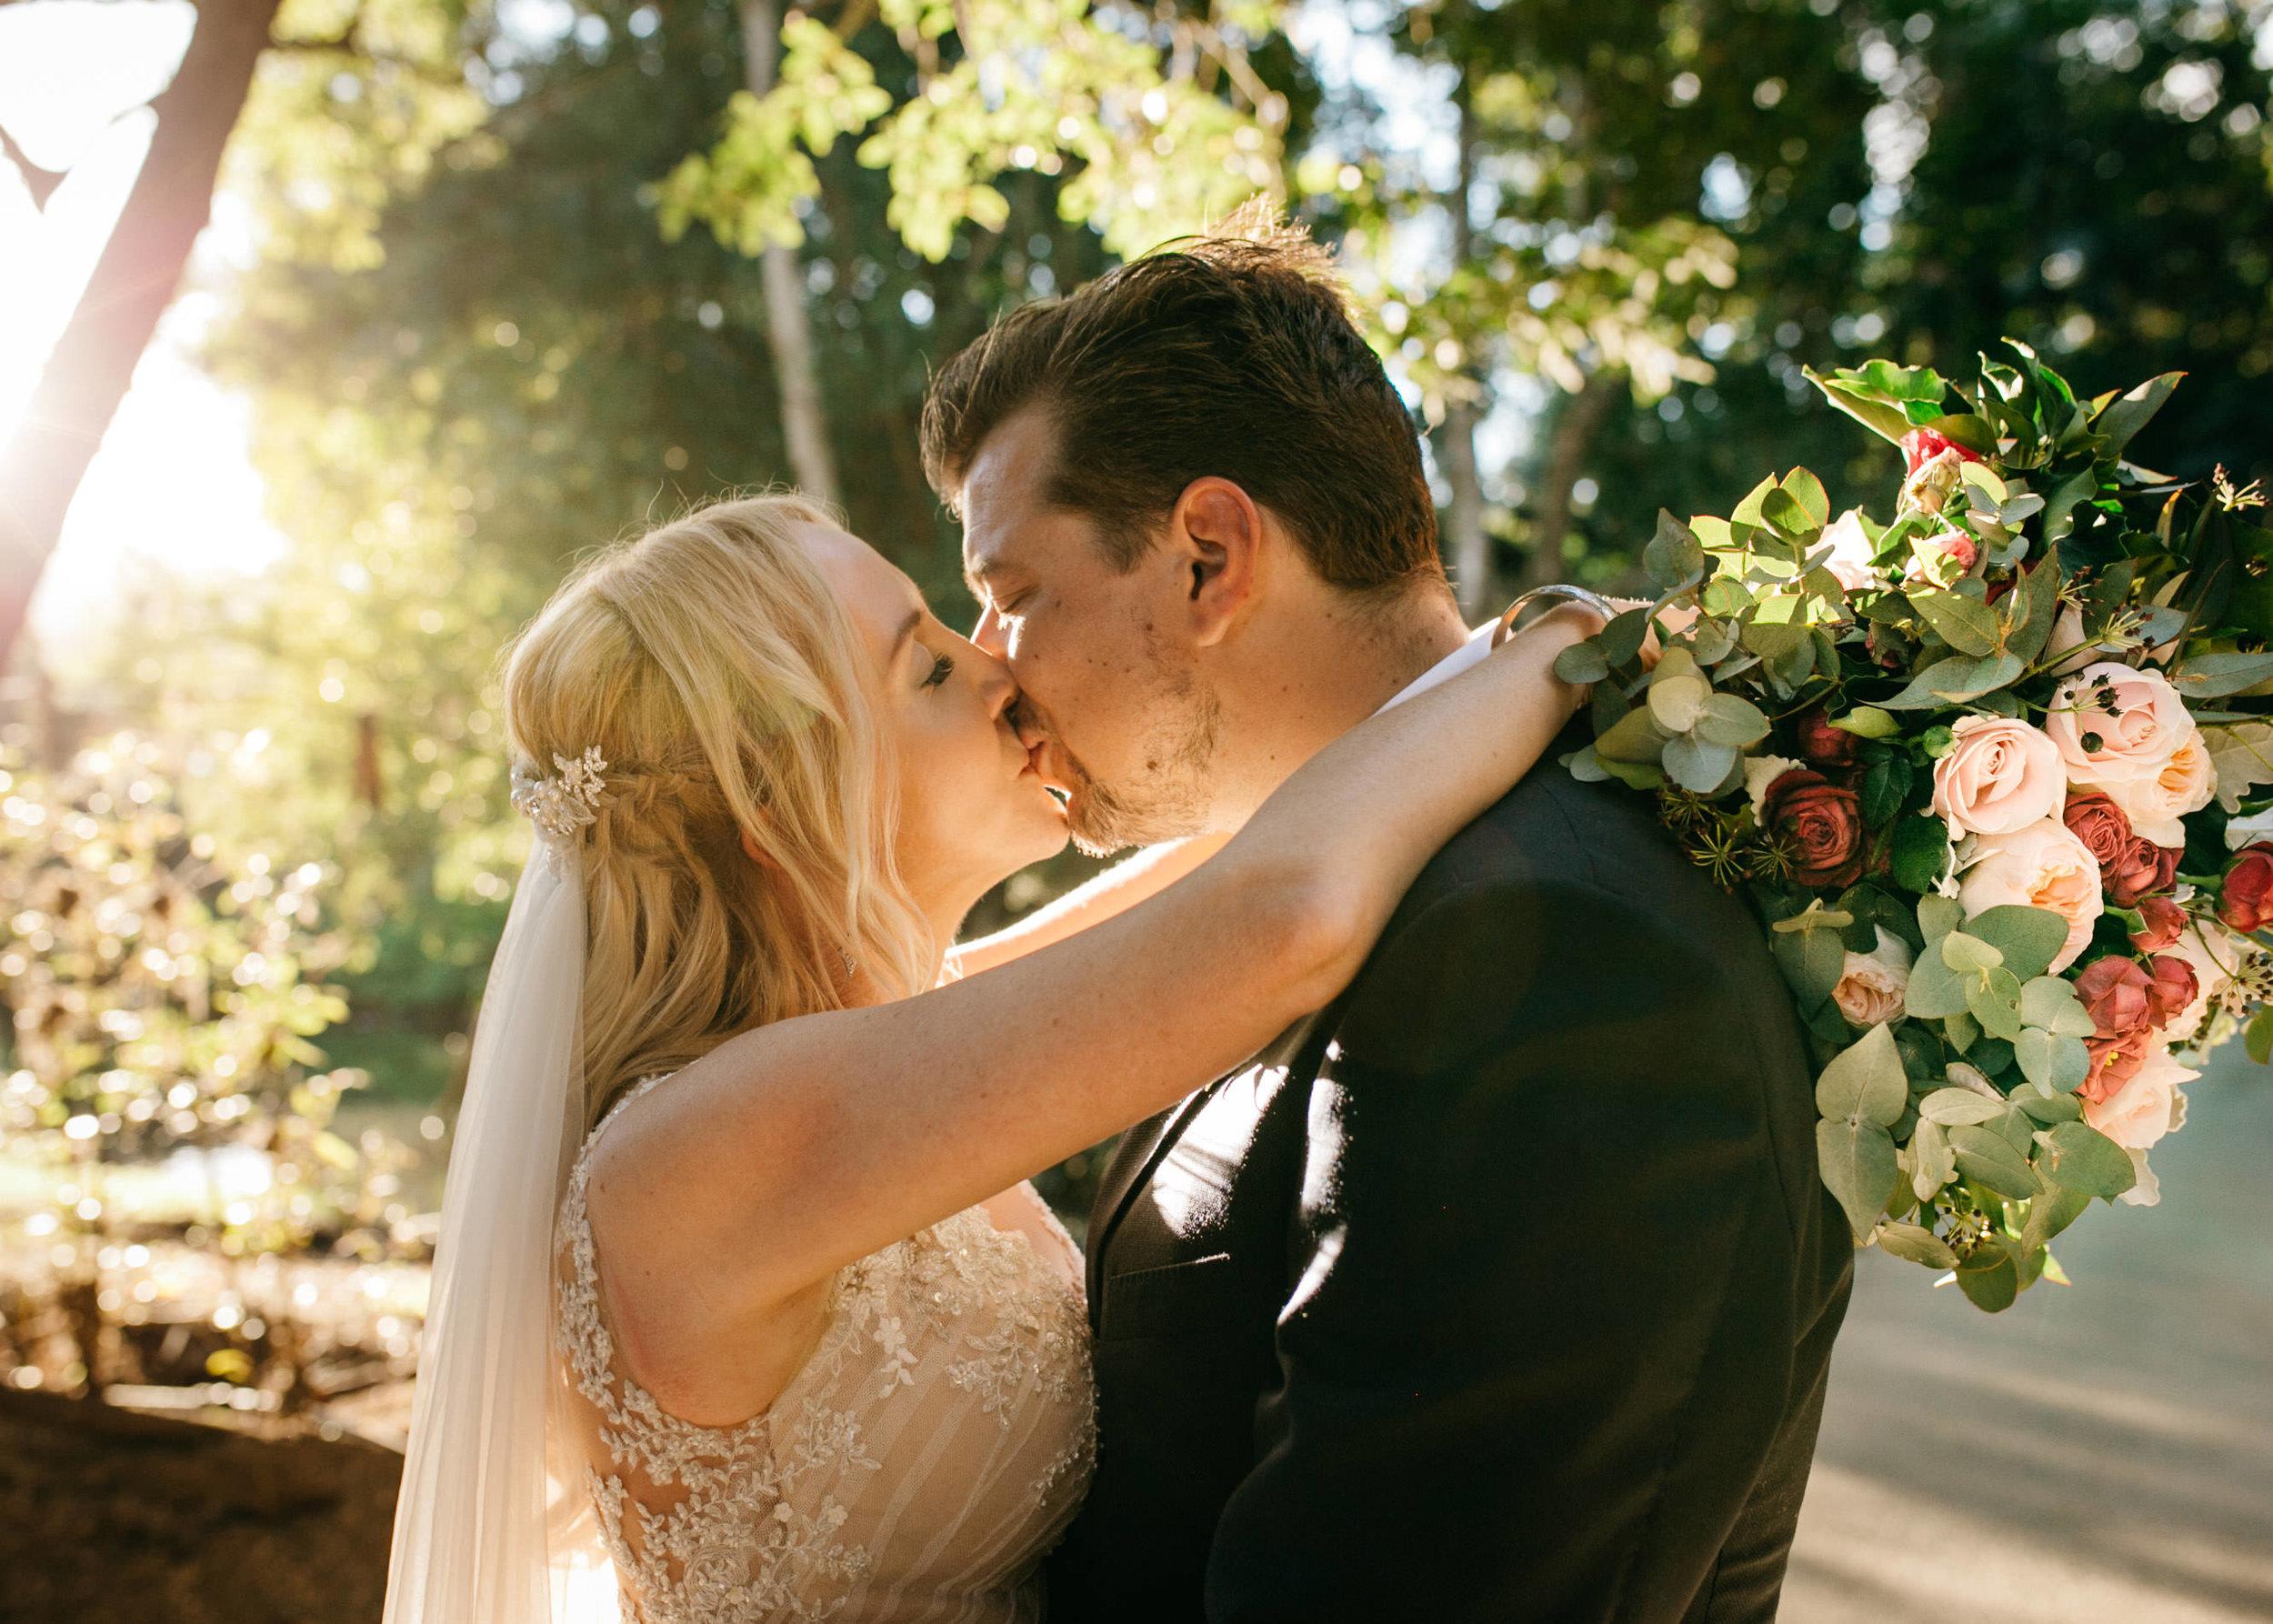 True North Photography_Boomerang Farm_Stacey and Isaac_Gold Coast Wedding_Barm Wedding_Hinterland Wedding-141.jpg